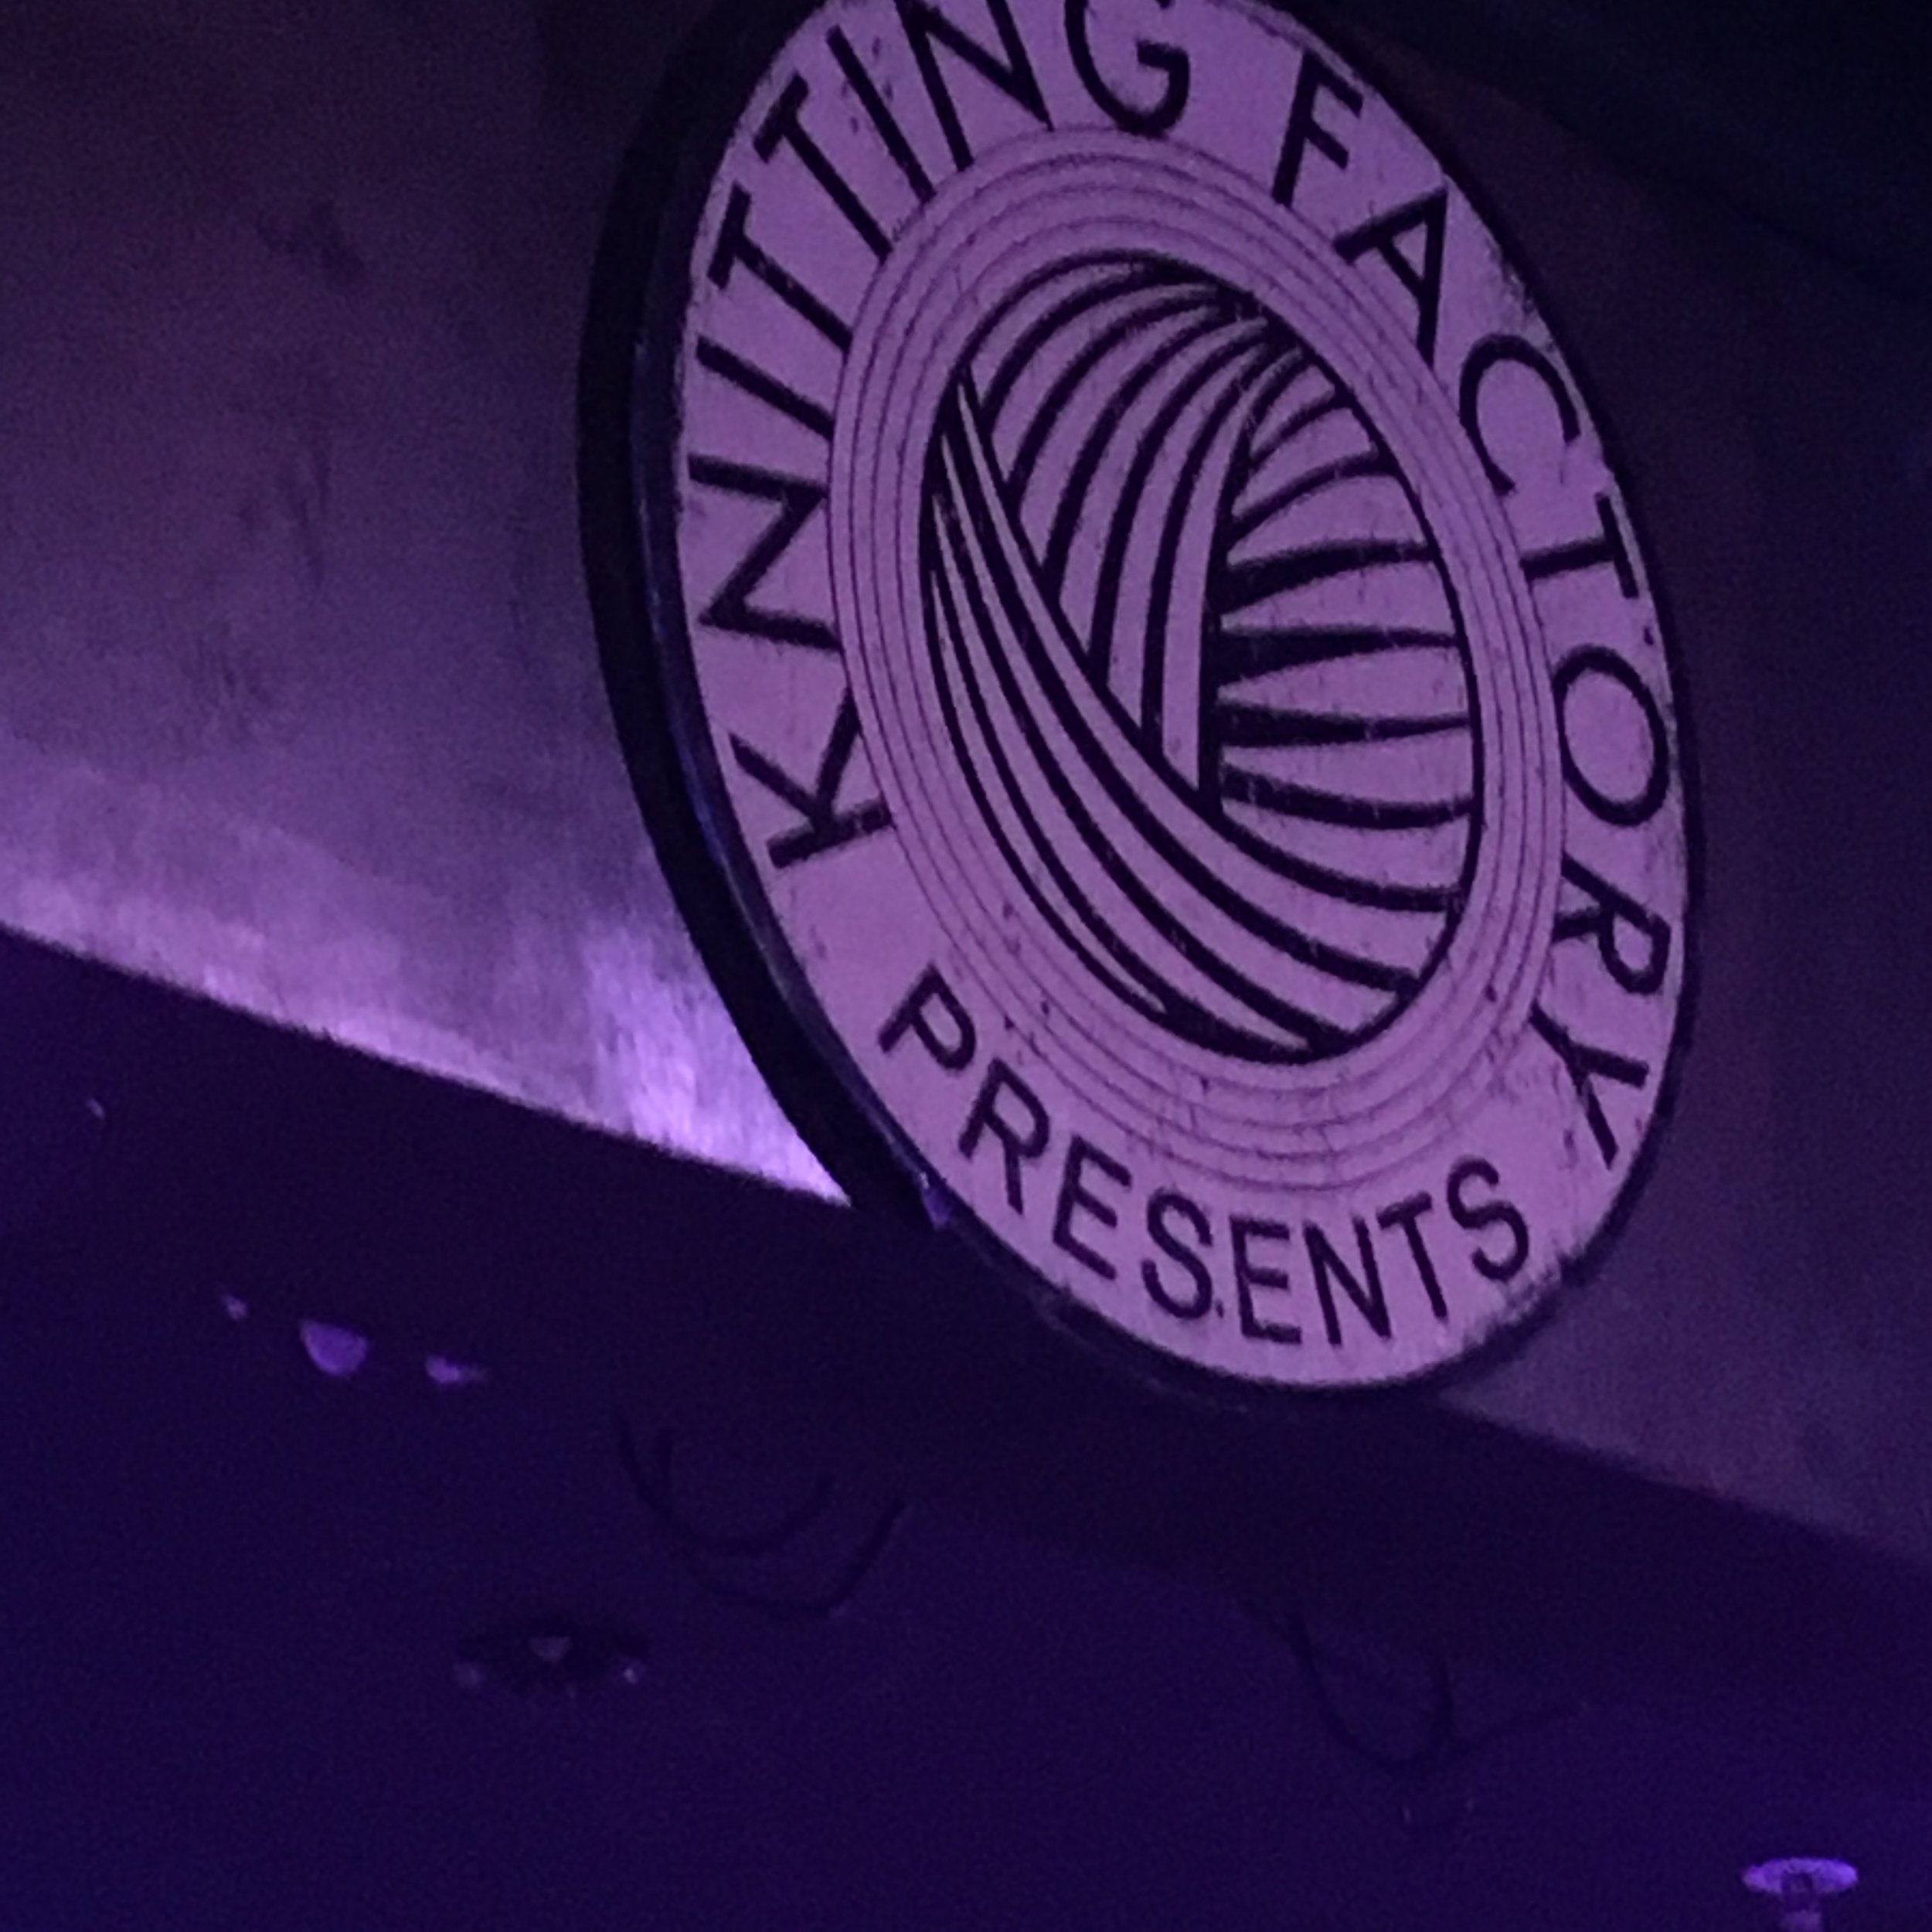 Automatik Eden Madland Release Show, Sept 9, 2016